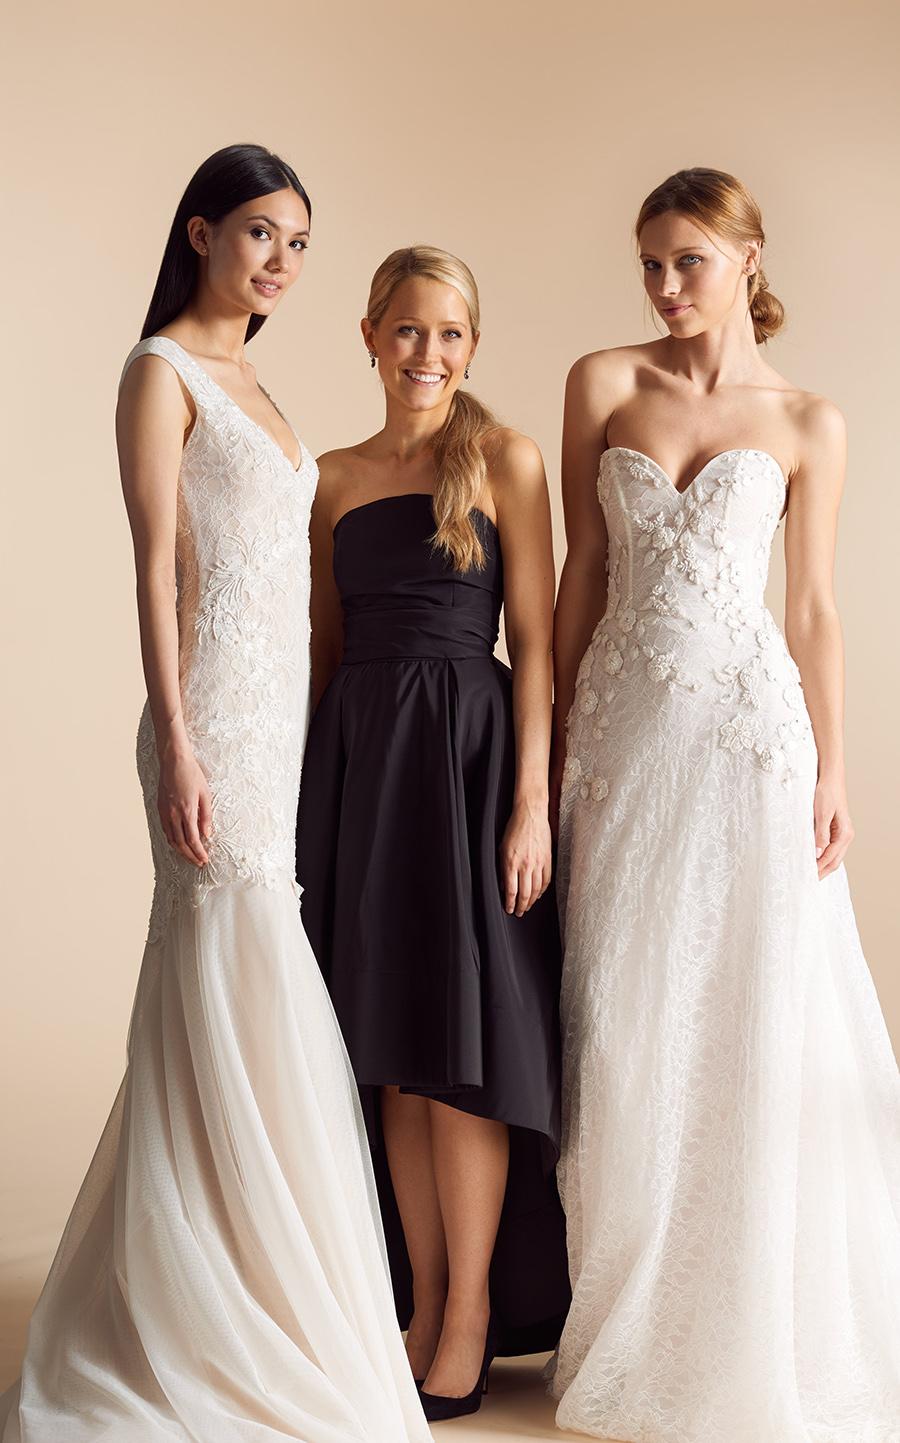 Introducing Allison Webb Wedding Dresses